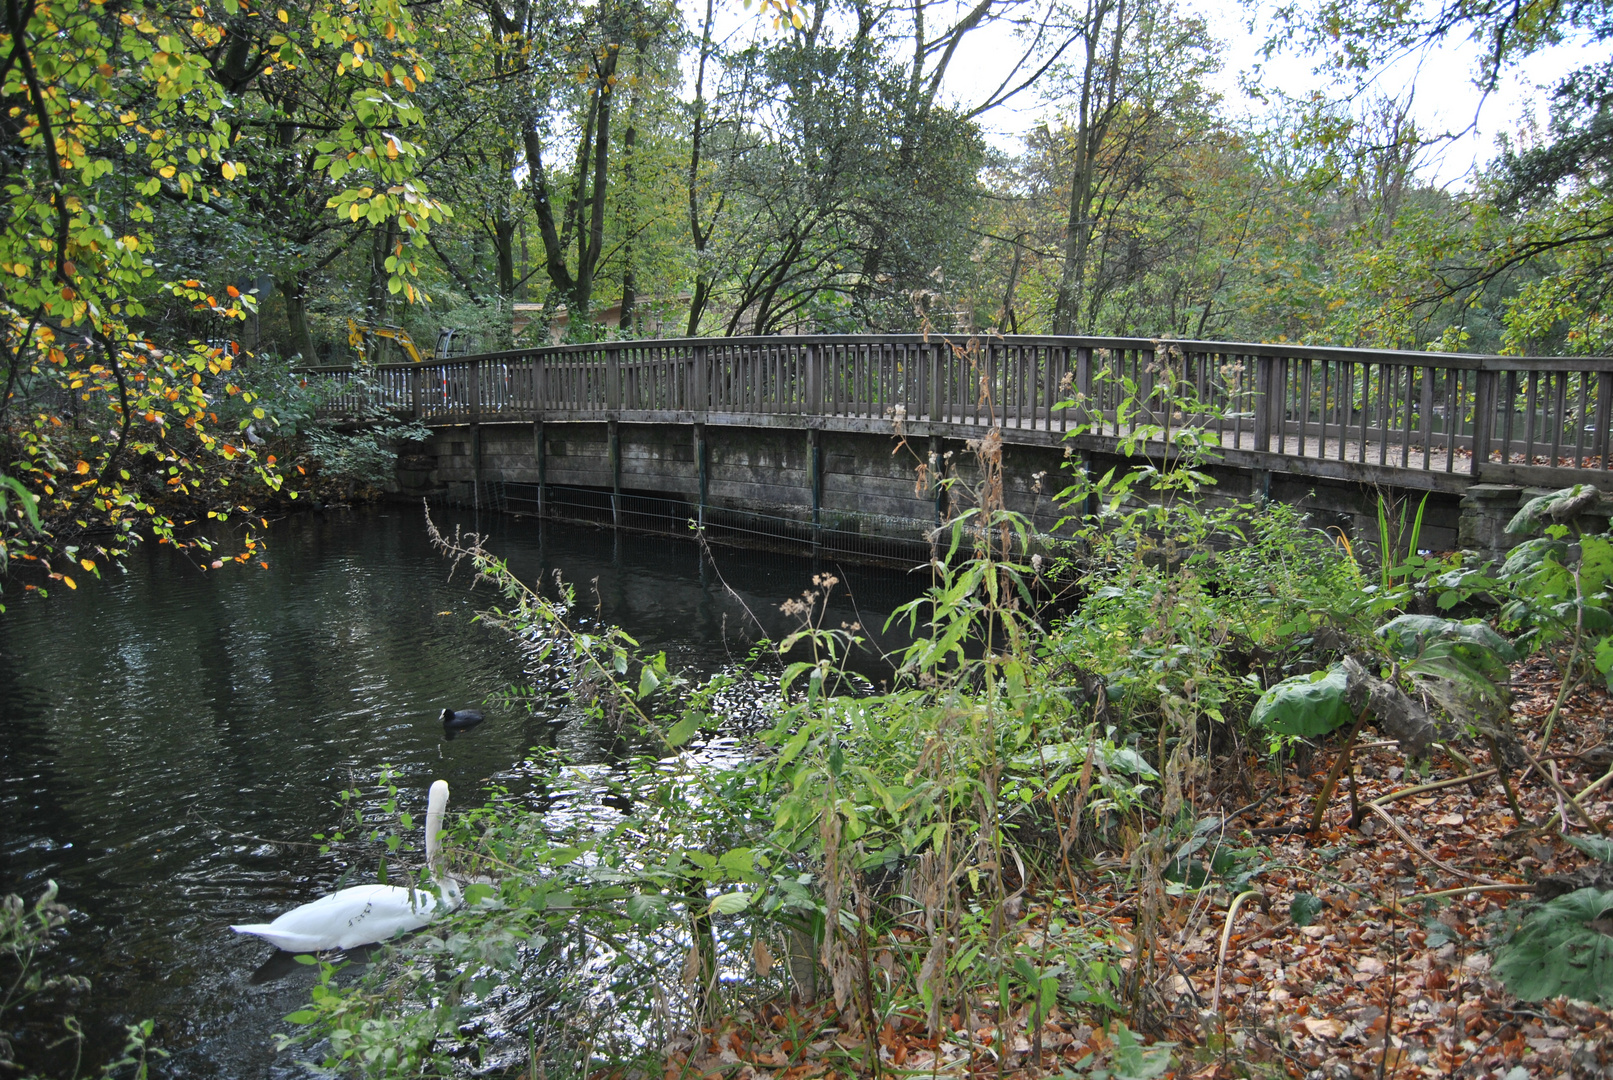 Brücke im nirgendwo